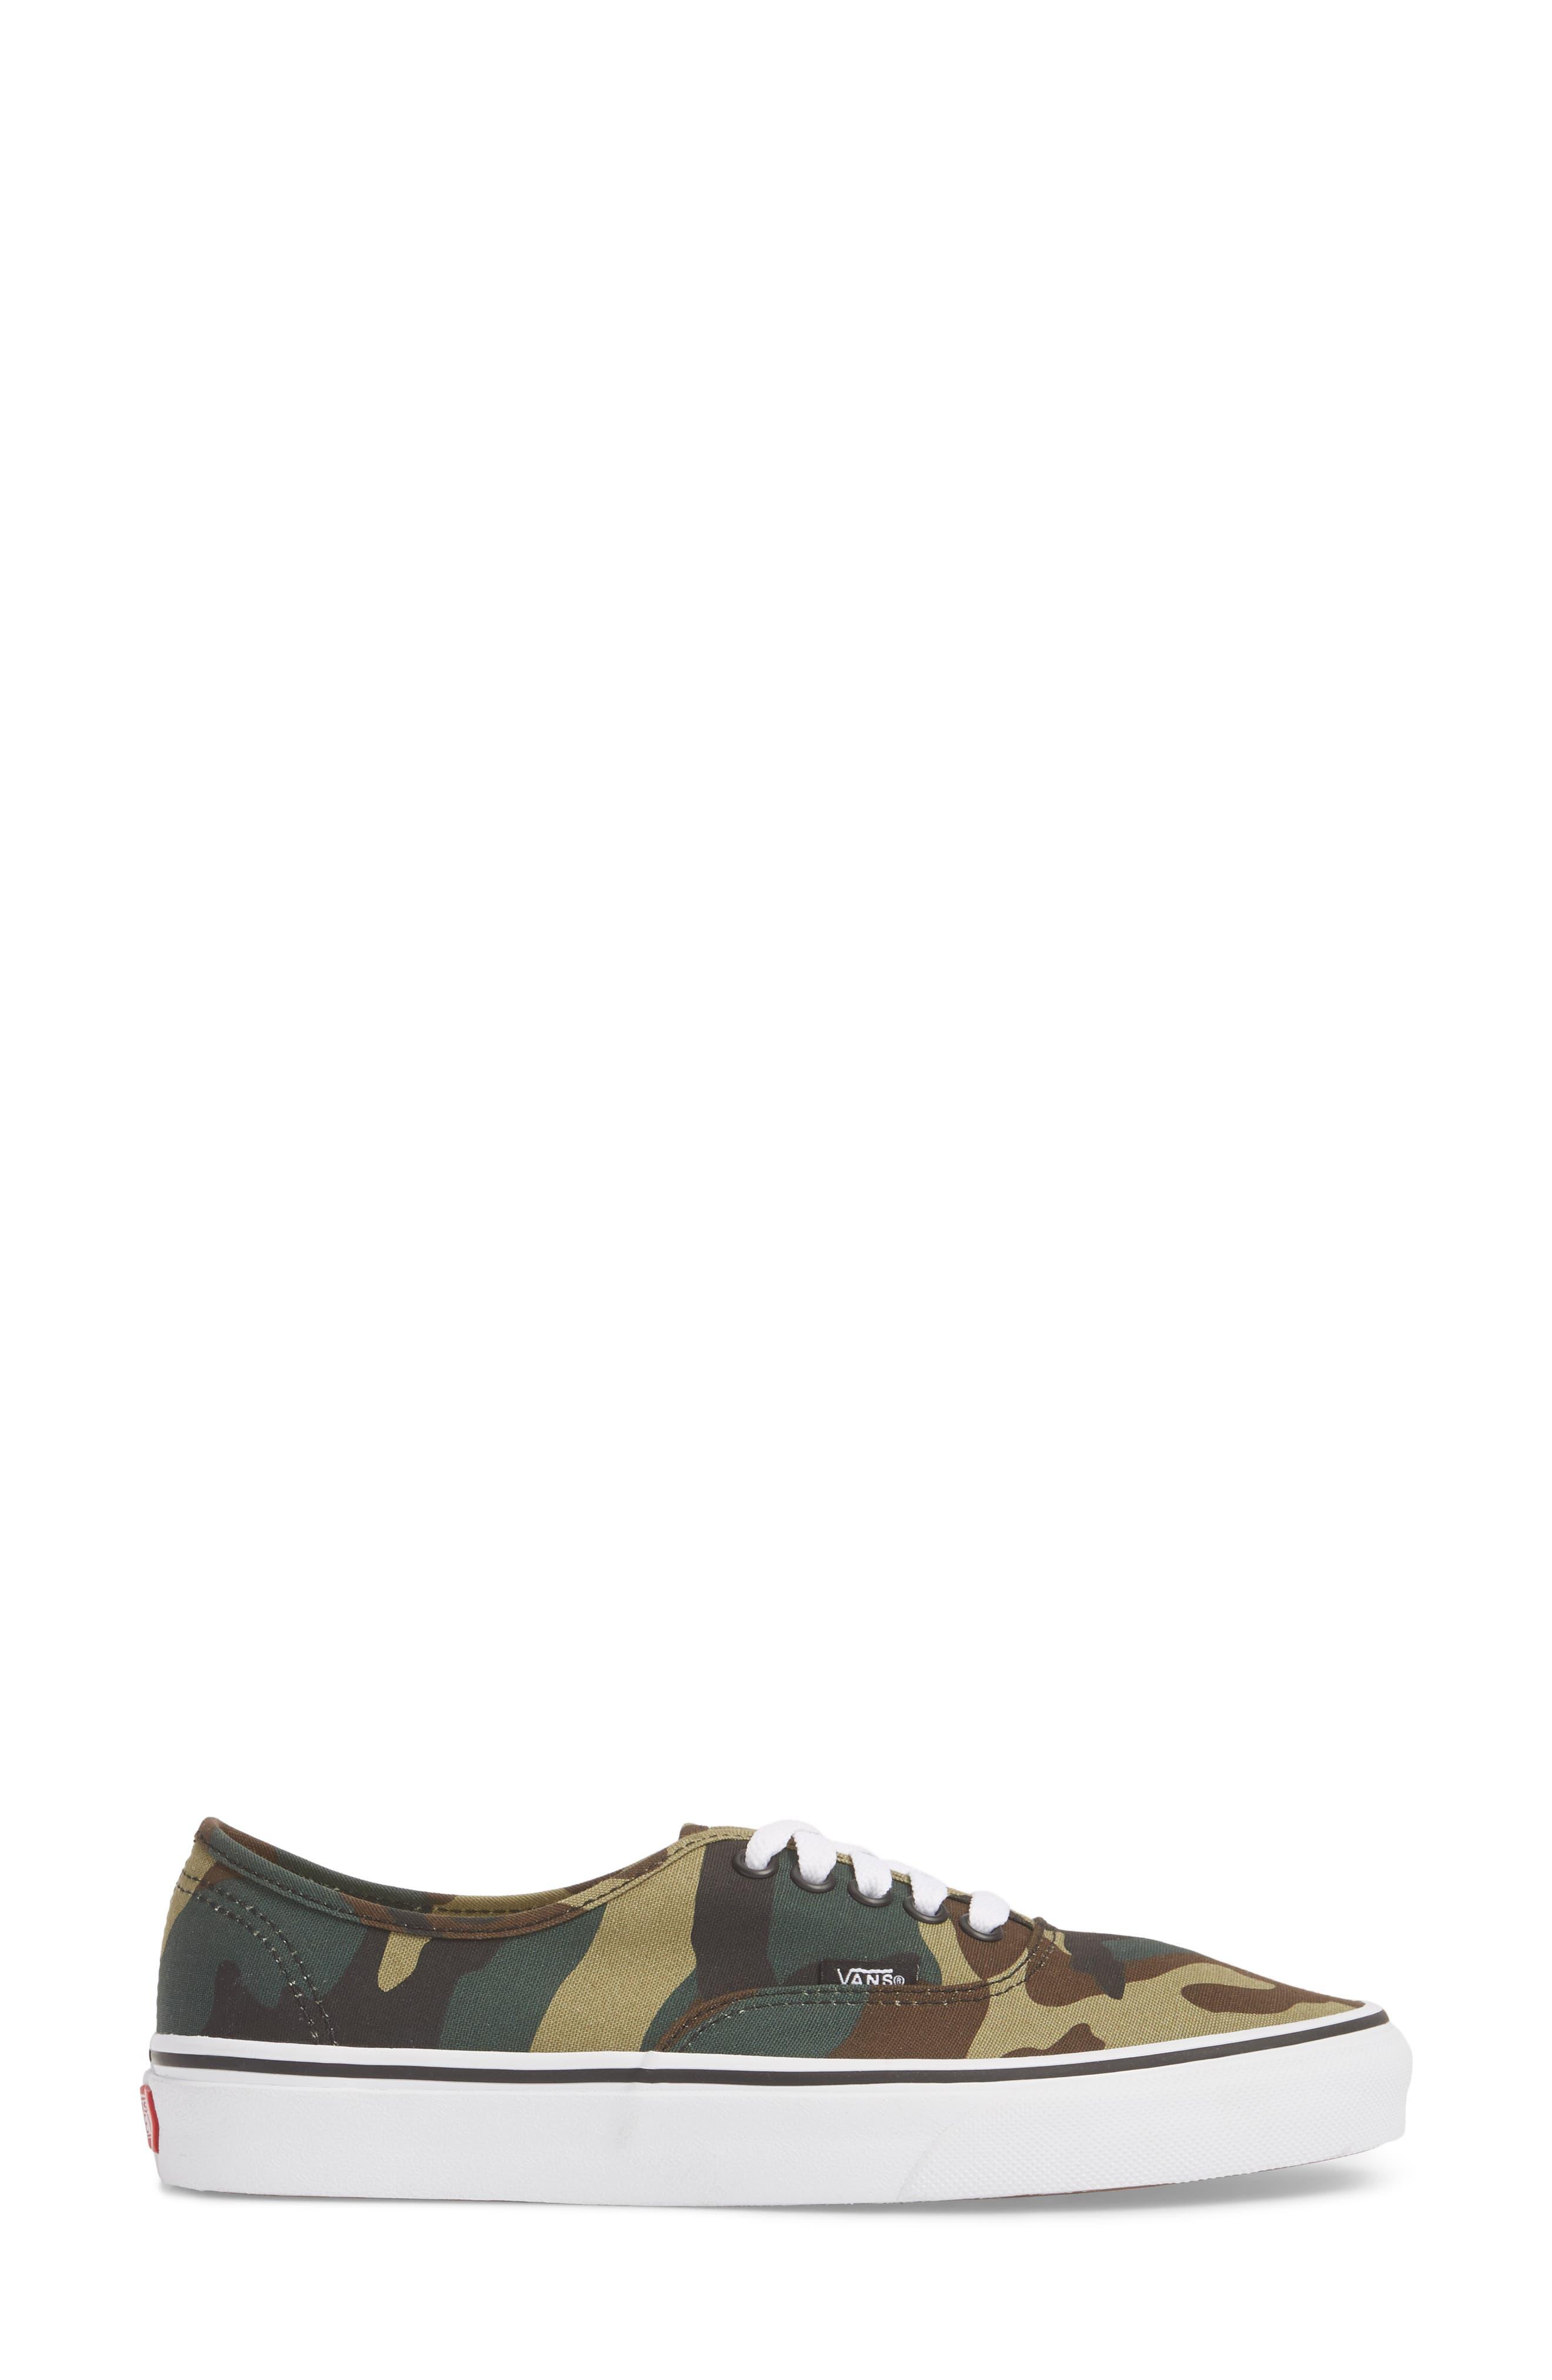 ,                             'Authentic' Sneaker,                             Alternate thumbnail 273, color,                             305